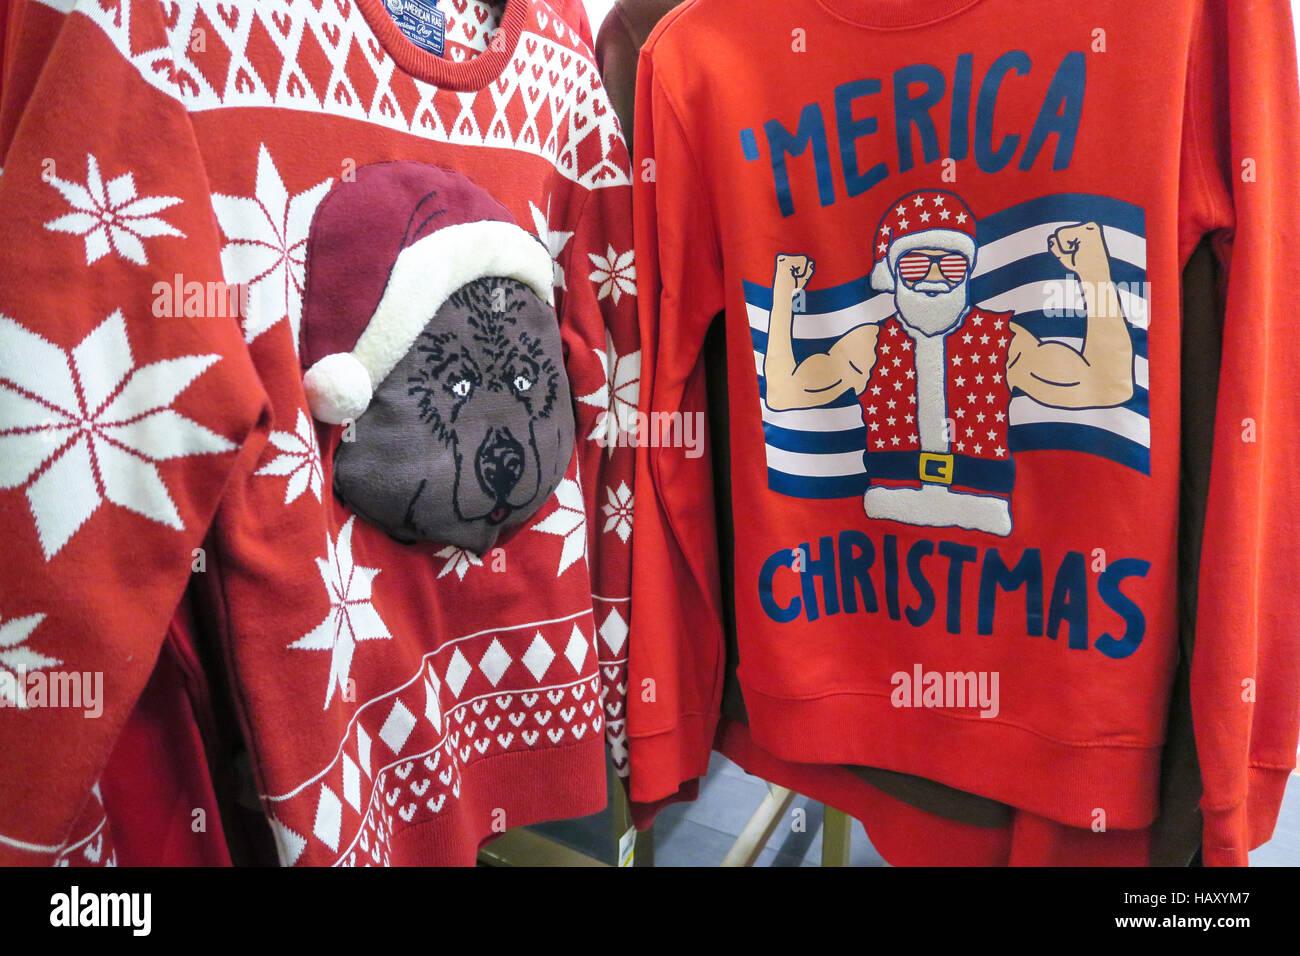 Macys Christmas Sweaters.Ugly Christmas Sweaters Stock Photos Ugly Christmas